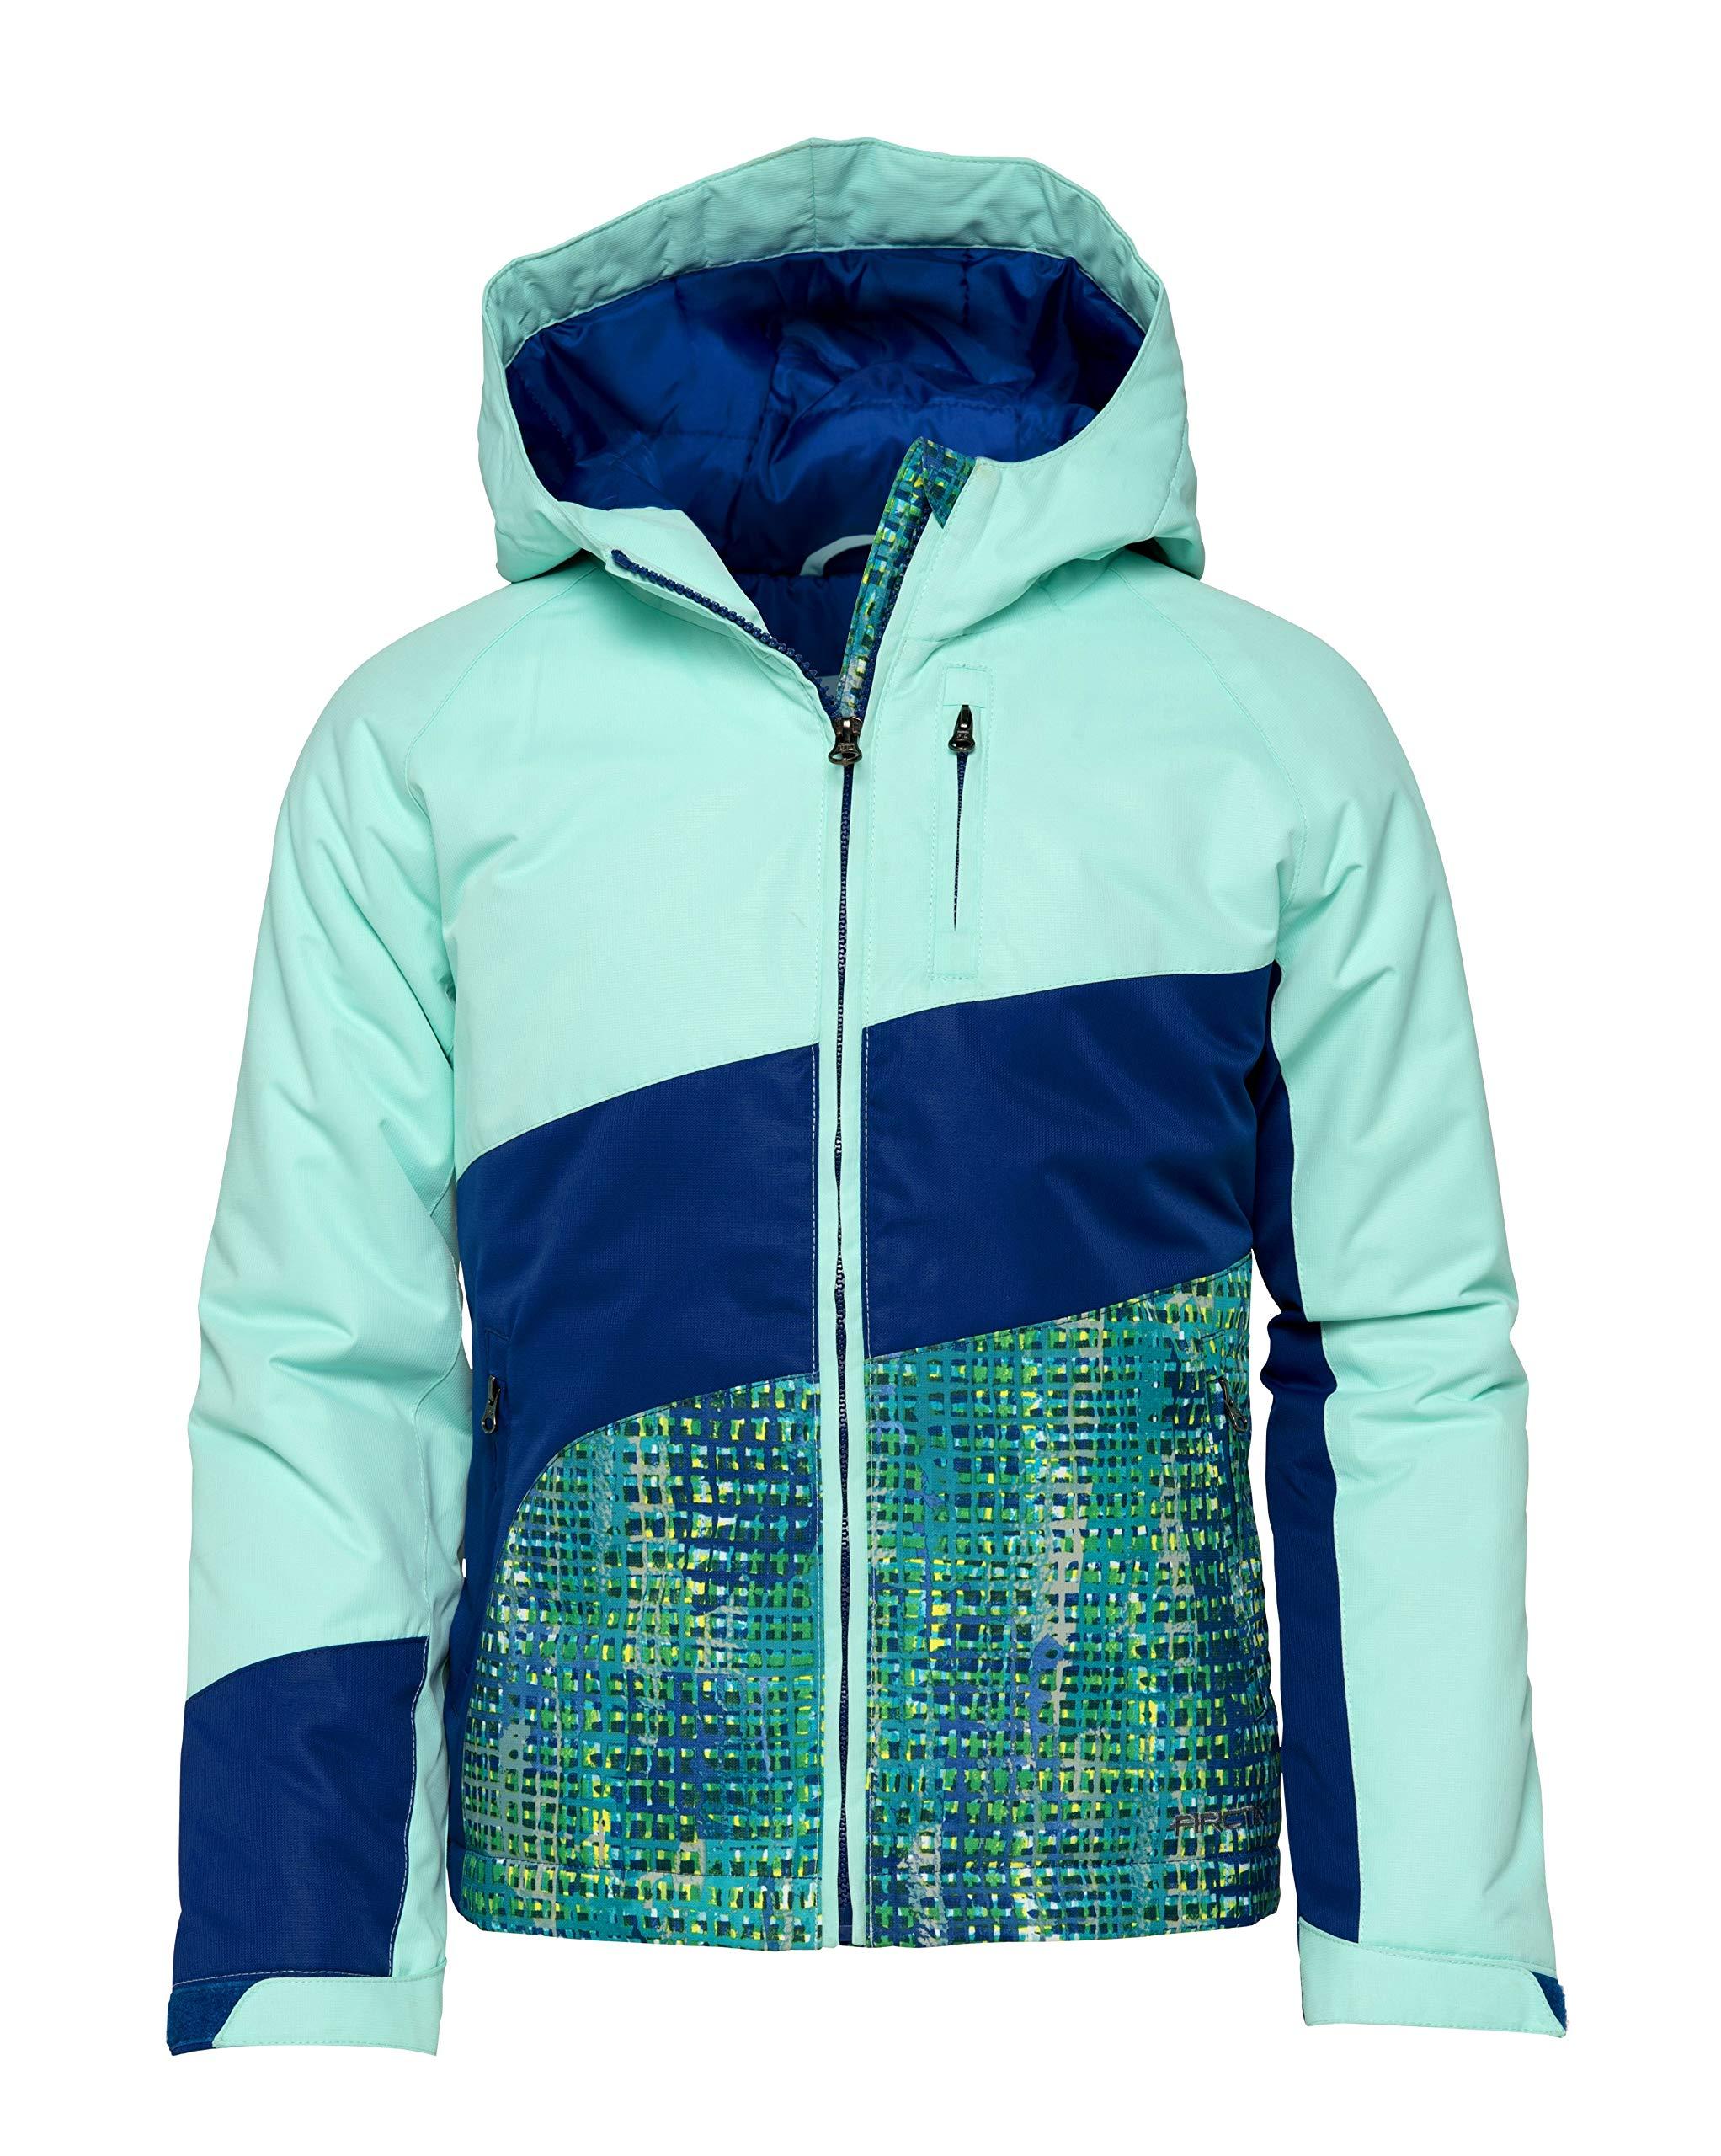 Arctix Girls Frost Insulated Winter Jacket, Island Azure, Medium by Arctix